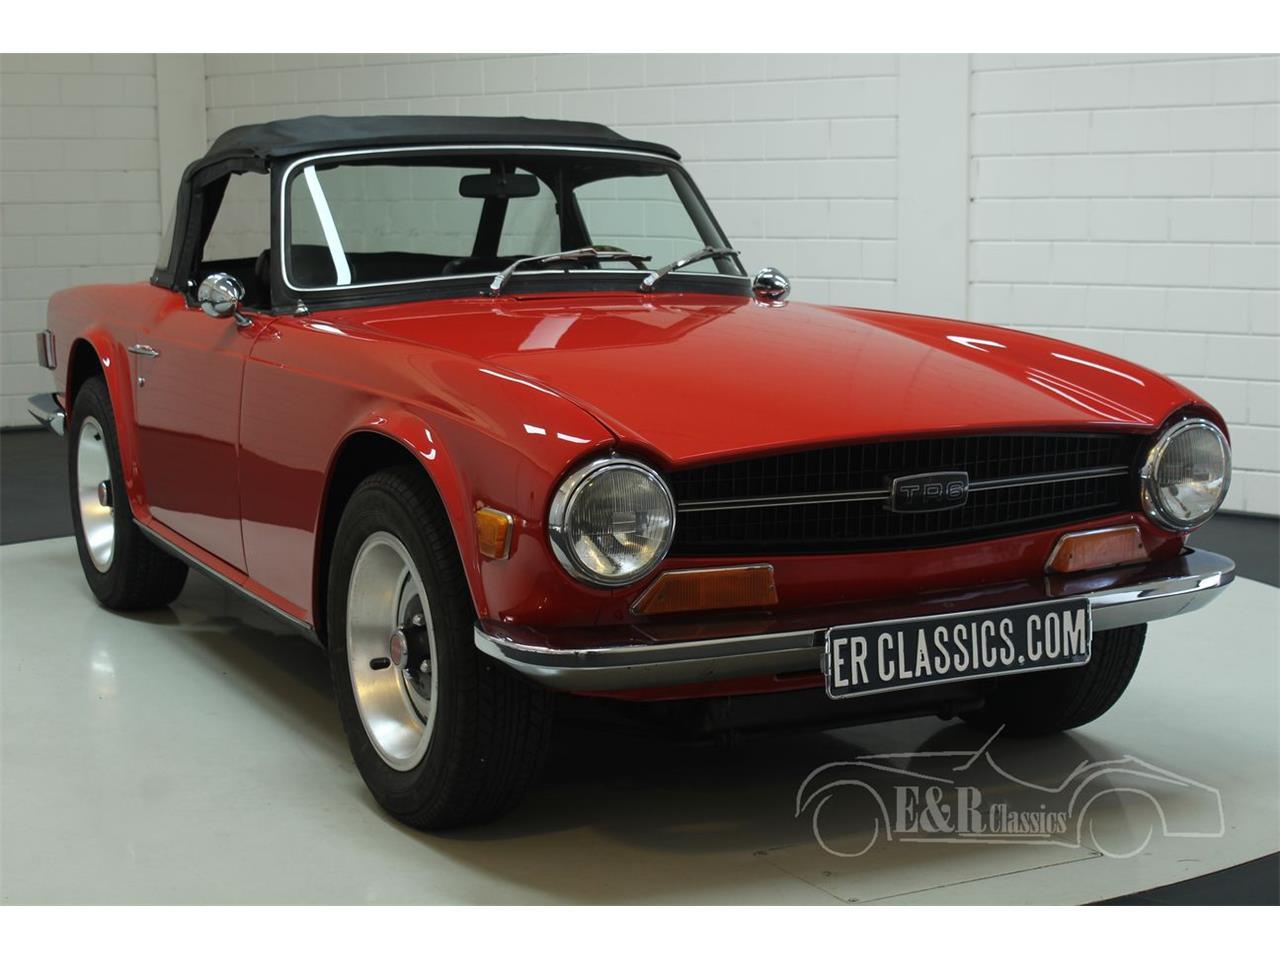 1970 Triumph TR6 (CC-1364332) for sale in Waalwijk, Noord-Brabant